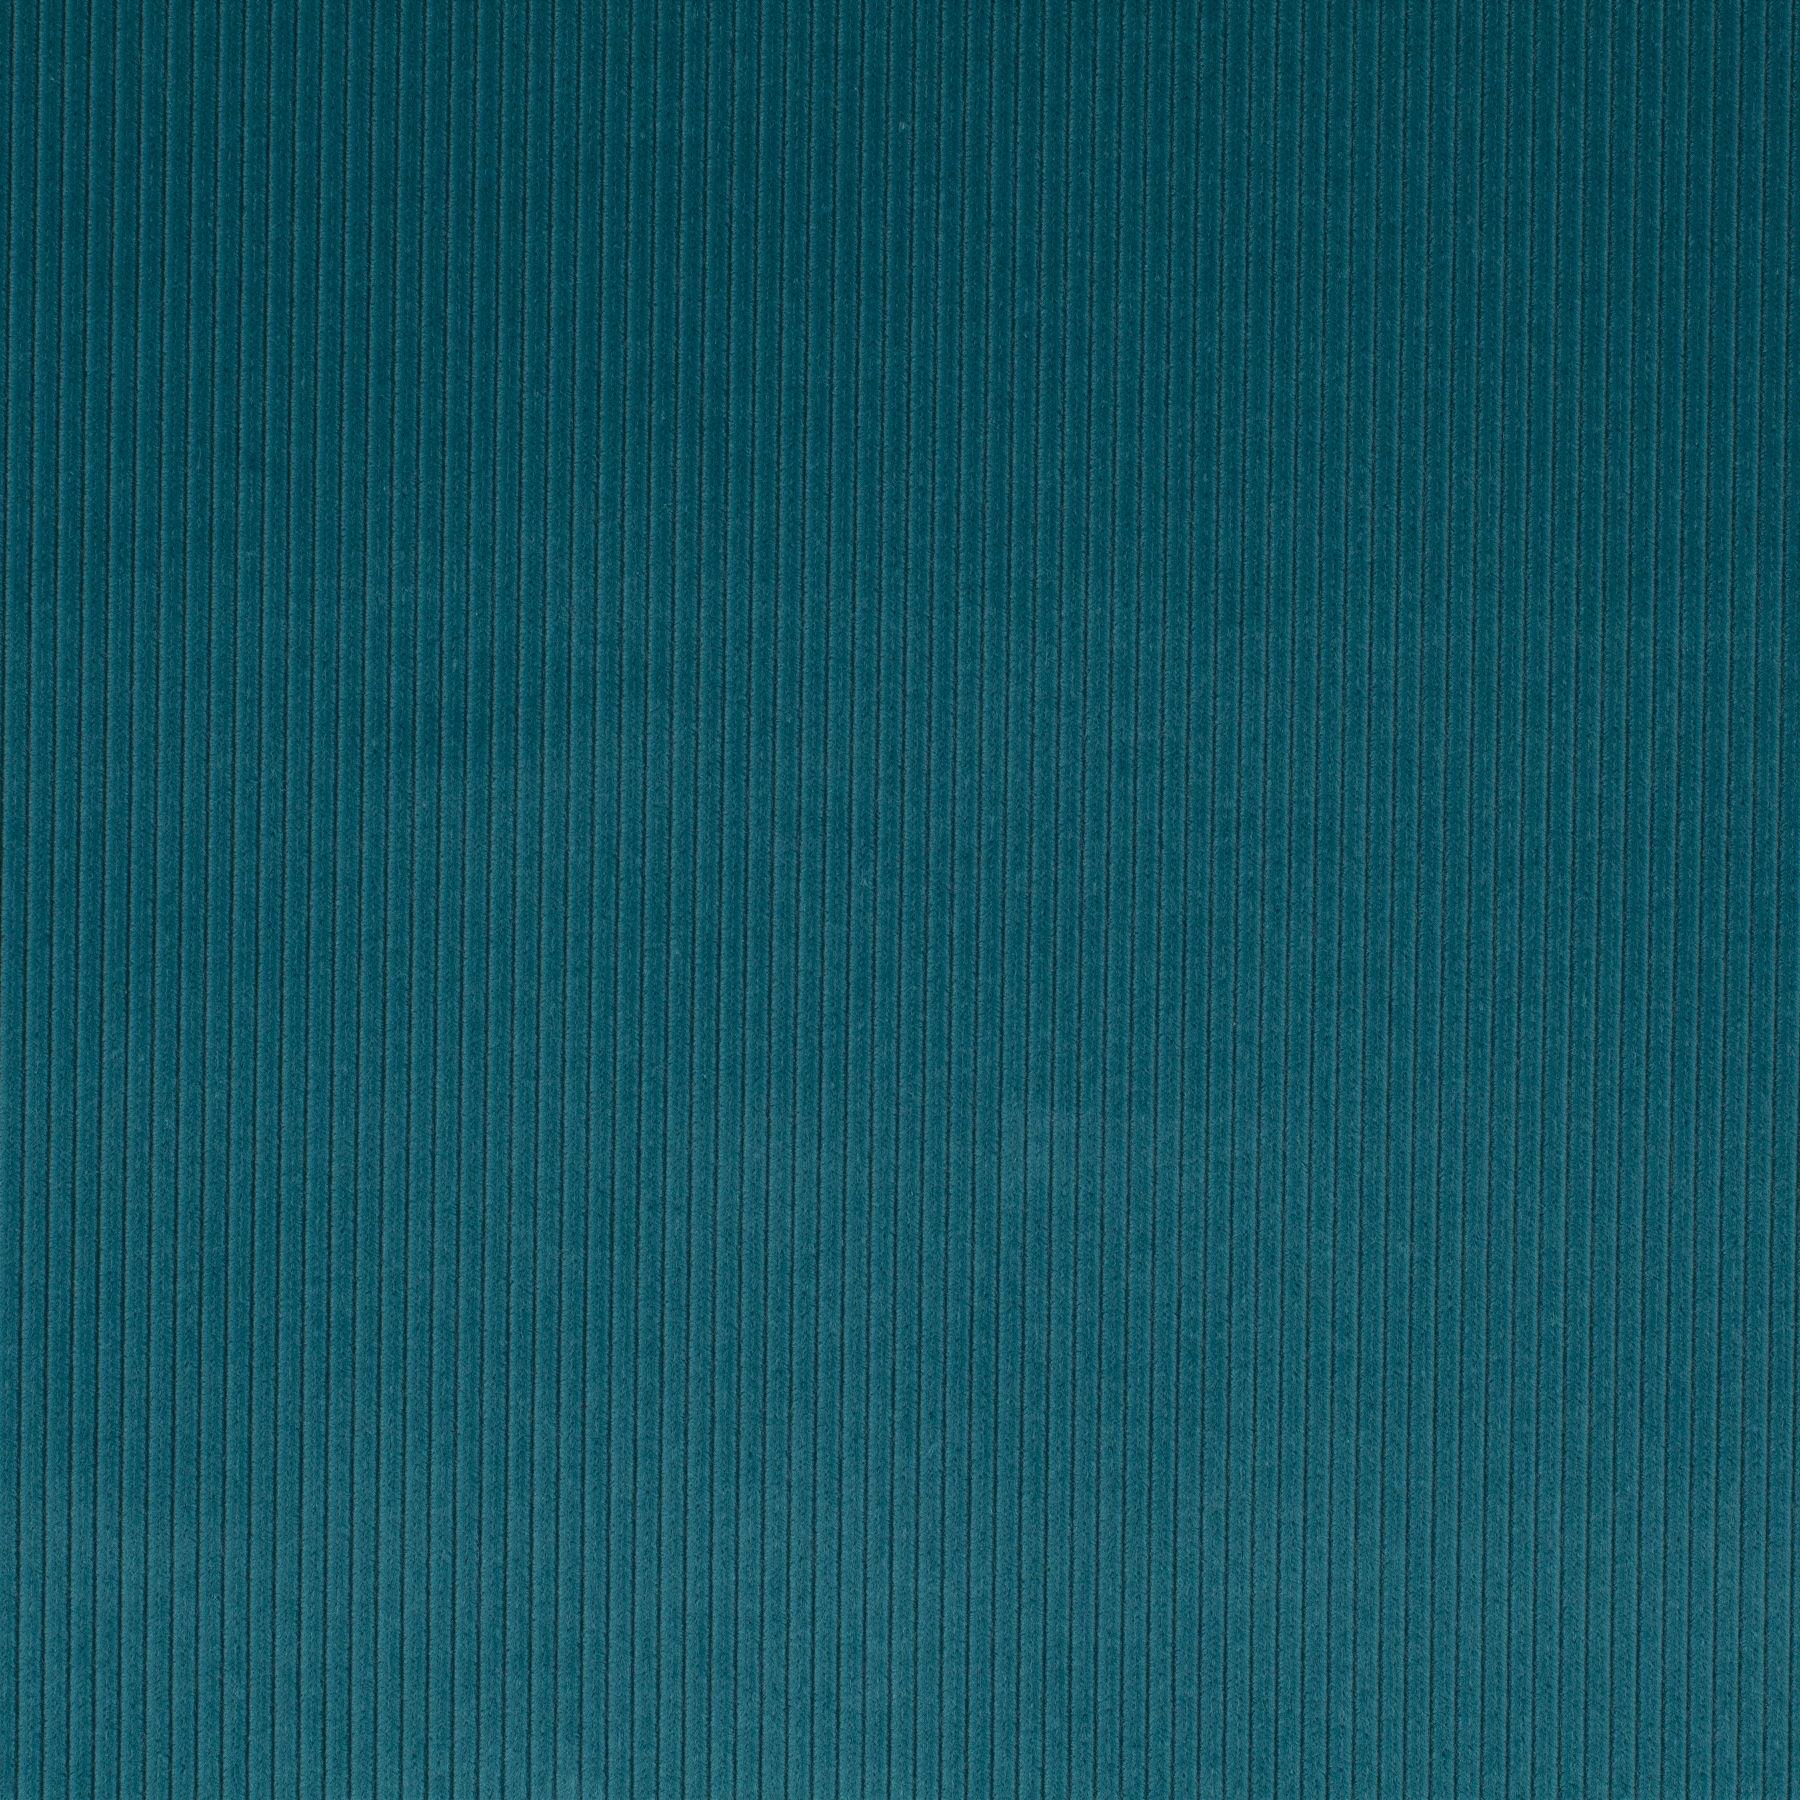 upholstery fabric cord 1 3126 082 jab anstoetz fabrics. Black Bedroom Furniture Sets. Home Design Ideas